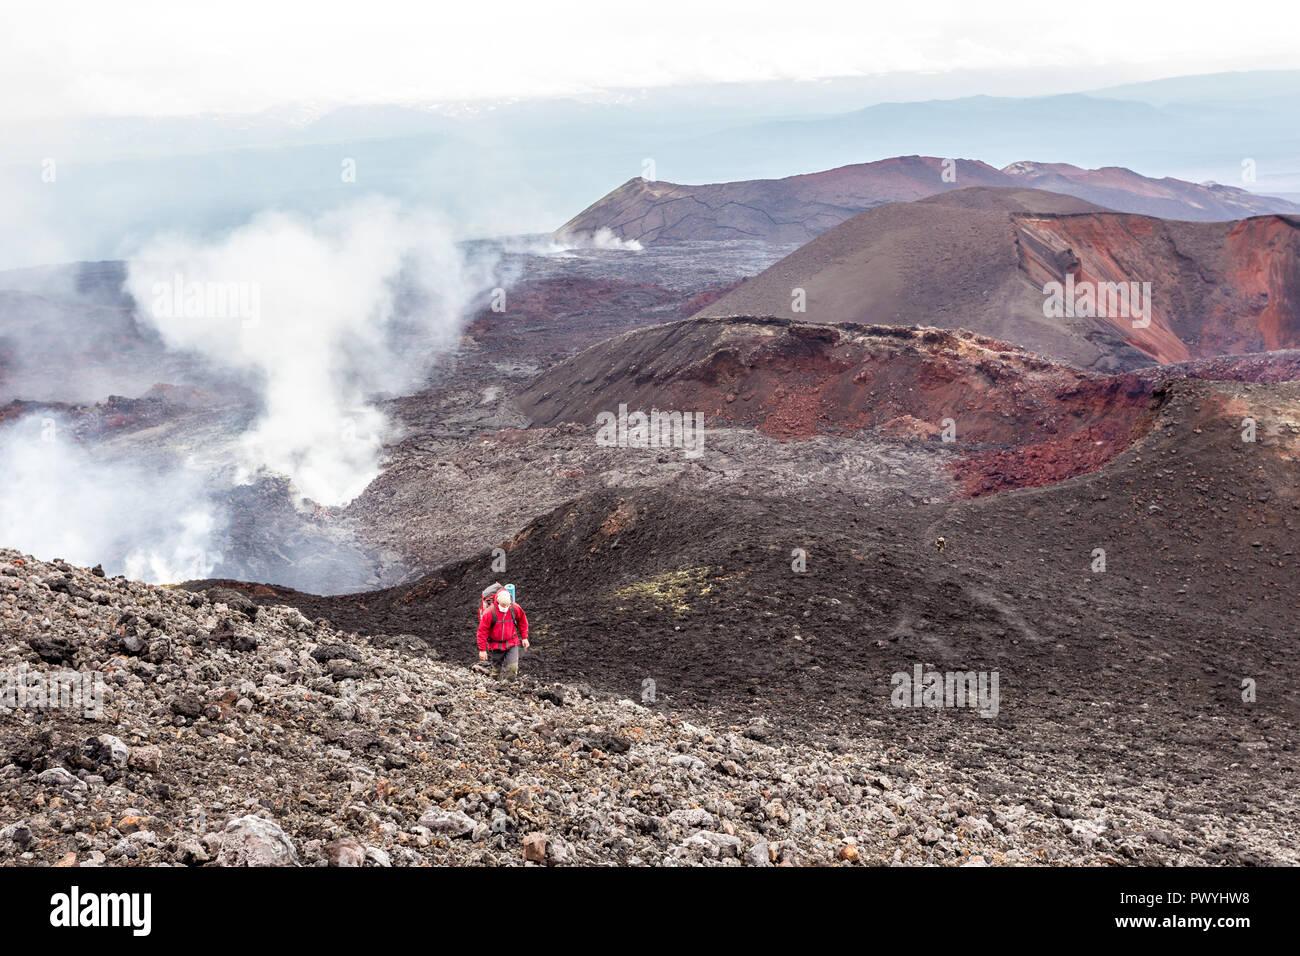 Petropavlovsk-Kamchatsky region, Russia - August 11, 2013: Tourist walking on a lava field near Tolbachik Volcano. - Stock Image